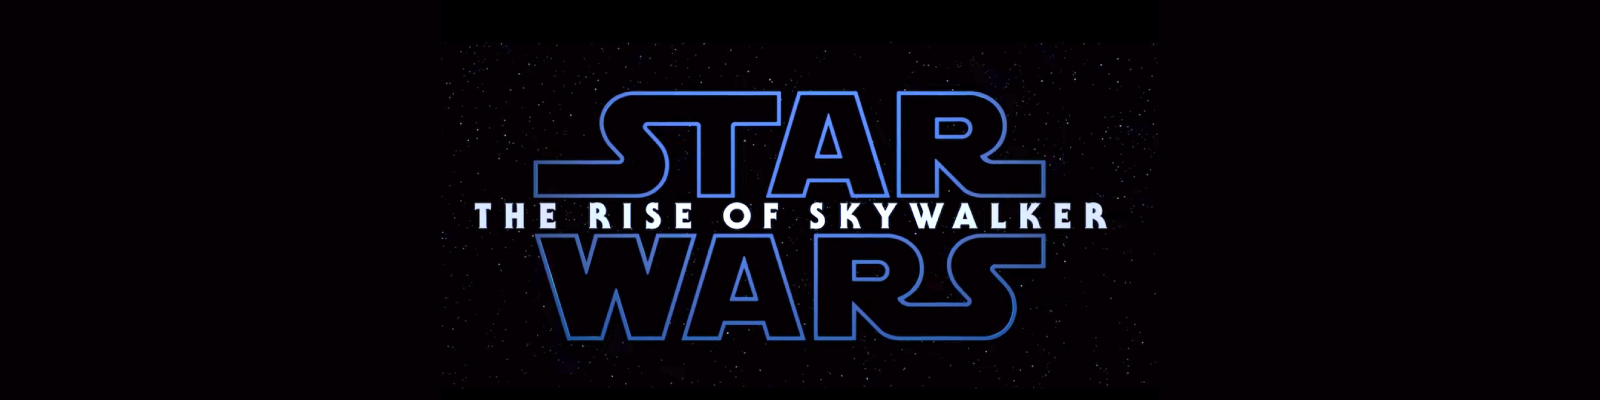 Star Wars - The Rise Of Skywalker Banner